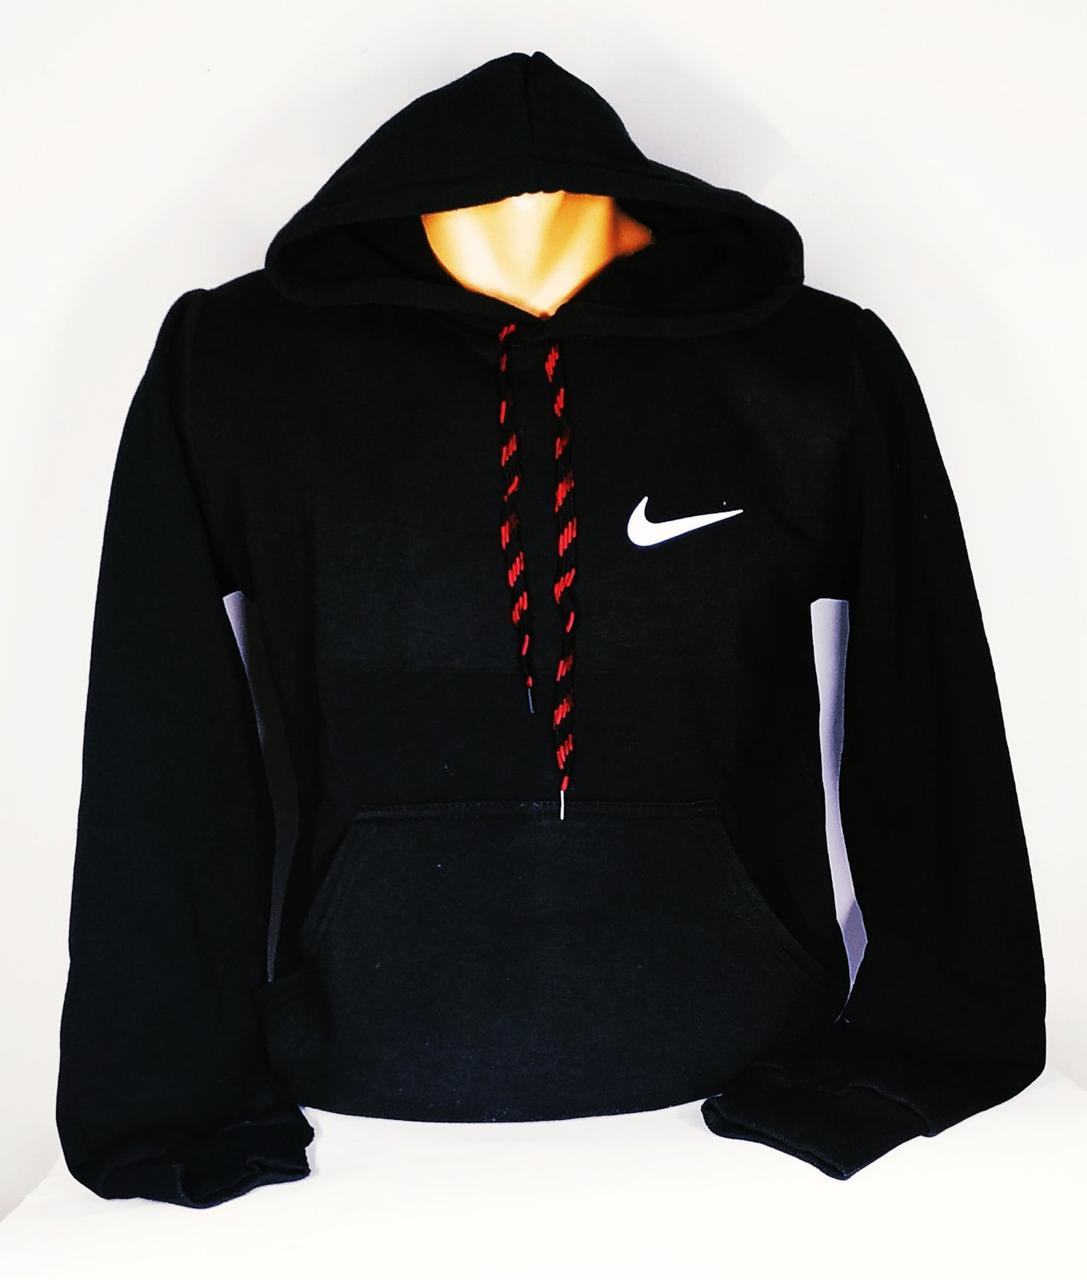 Nike мужская толстовка, длинный рукав, Худи